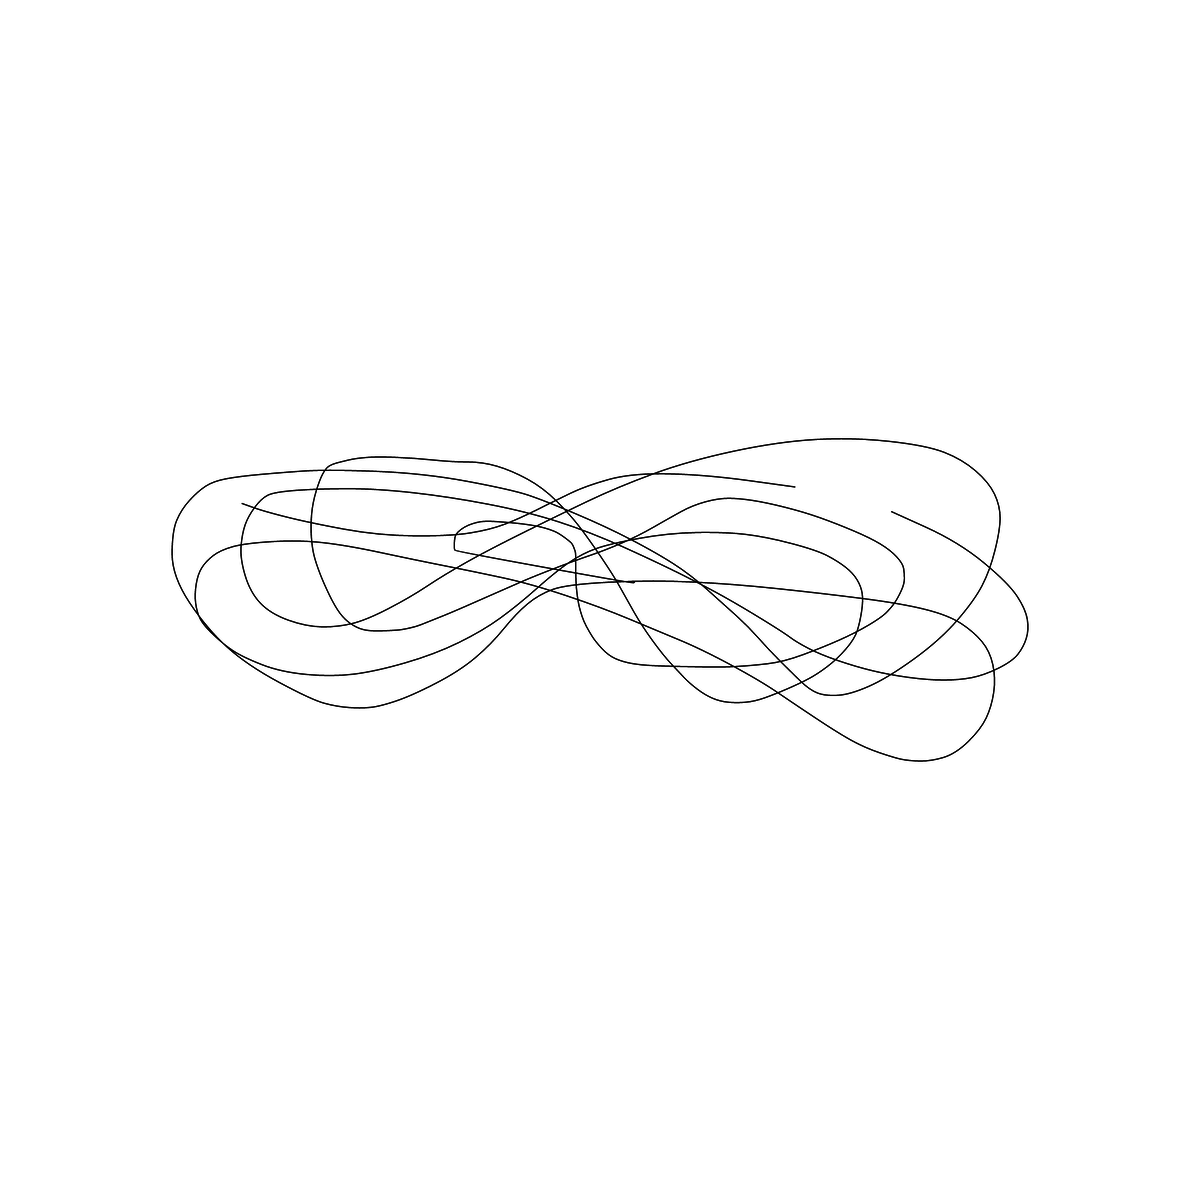 BAAAM drawing#19015 lat:53.0966300964355500lng: 6.5435571670532230